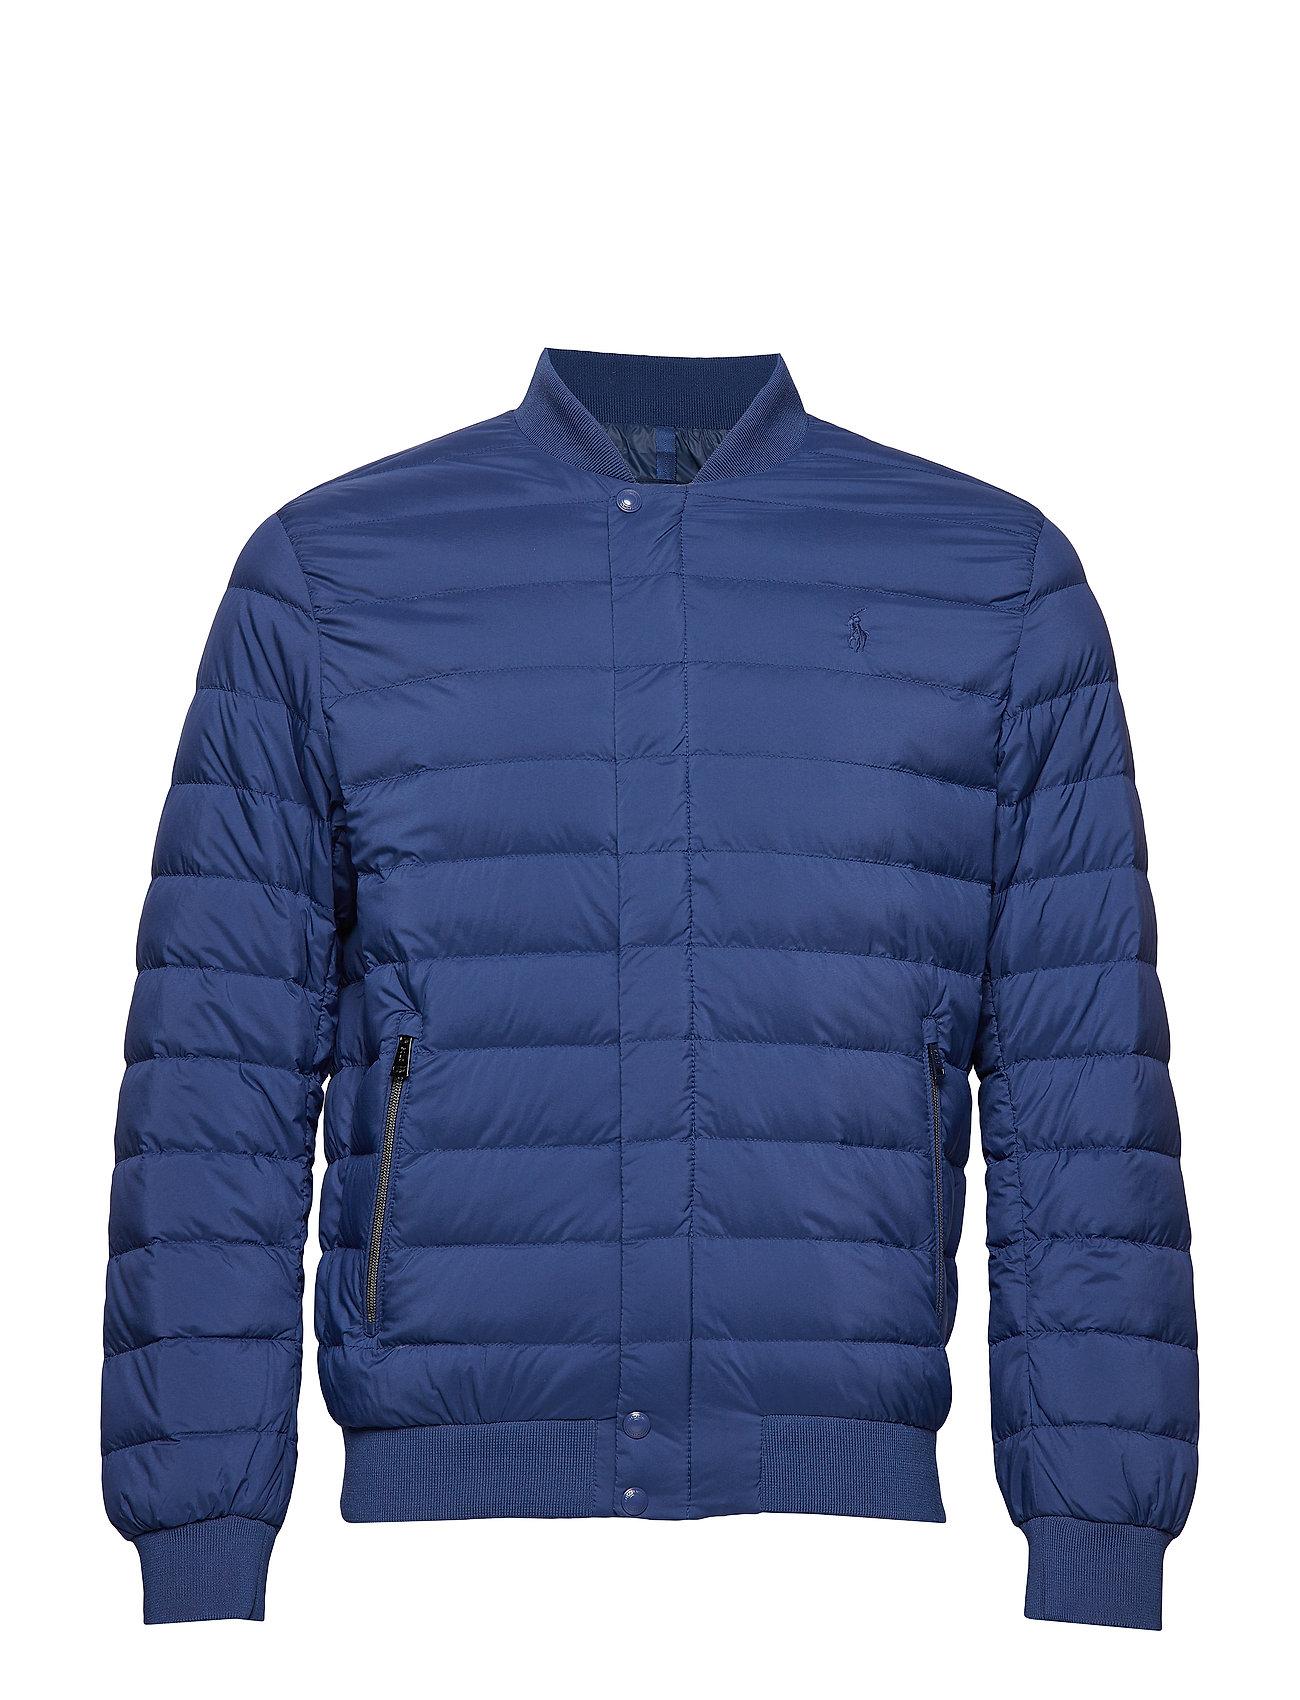 Polo Ralph Lauren Packable Down Baseball Jacket - ANNAPOLIS BLUE